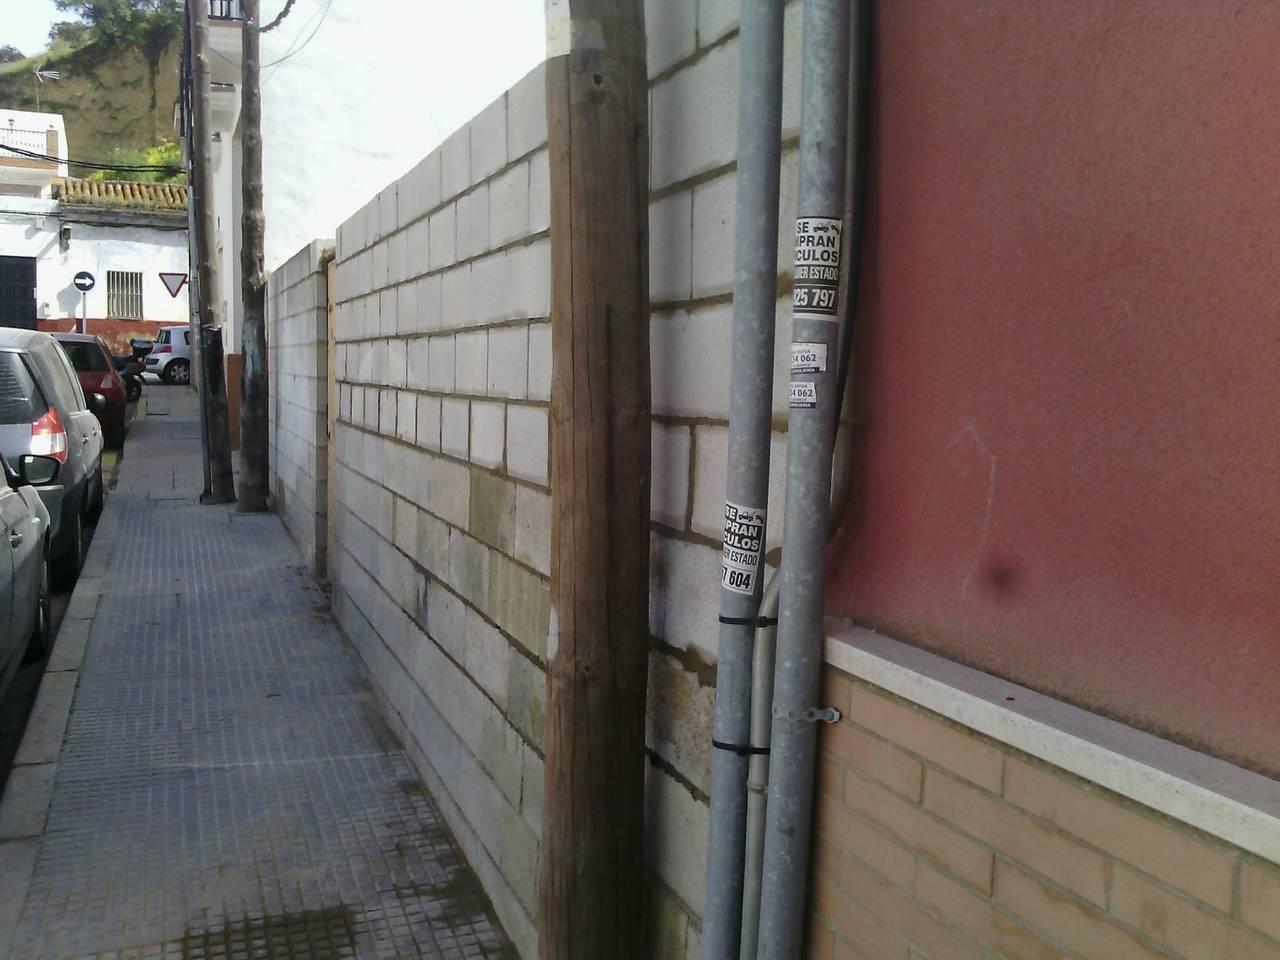 Venta solar en Huelva.  - Foto 6